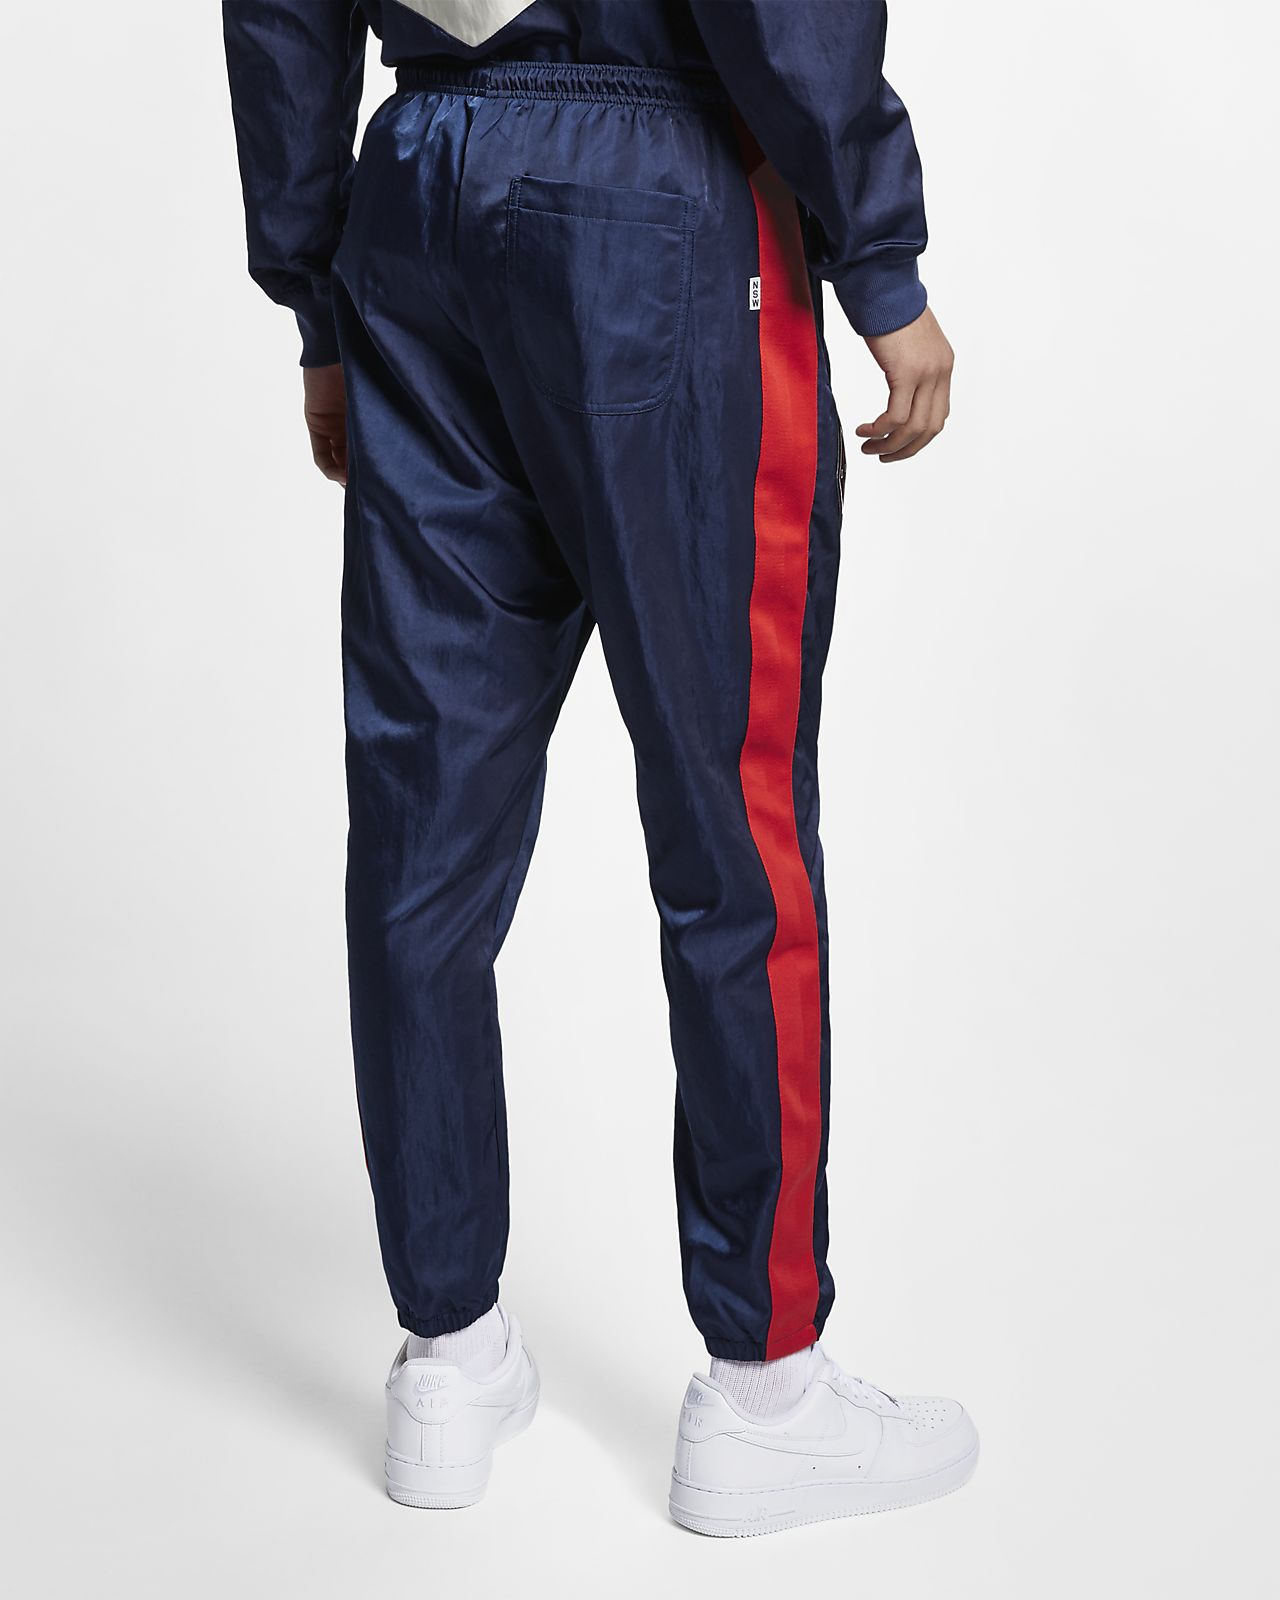 657ae616689f5 Nike Sportswear NSW Men's Woven Pants. Nike.com